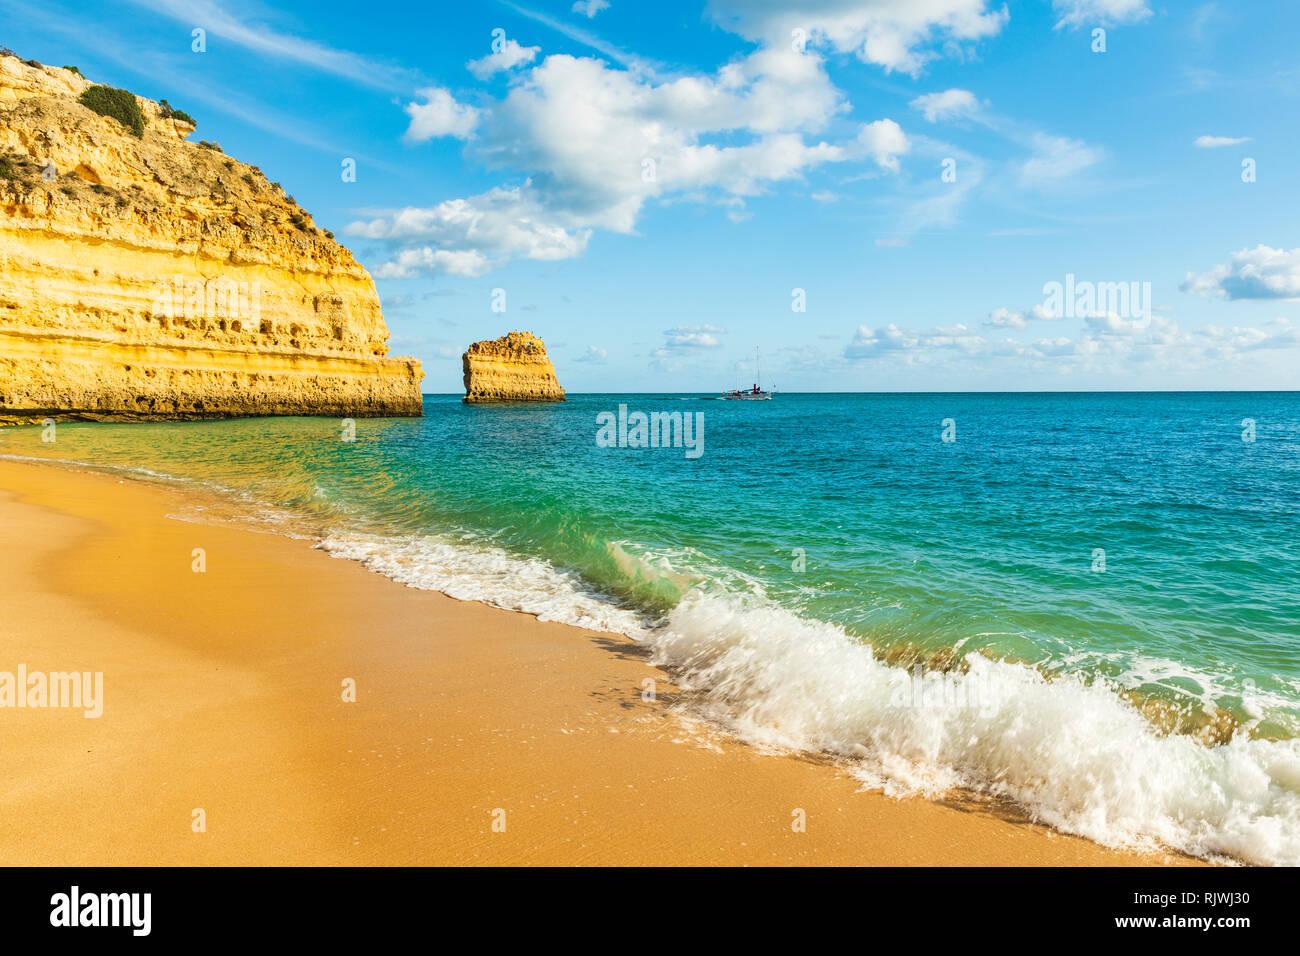 Waves lapping at sandy beach, Praia da Marinha, Algarve, Portugal, Europe - Stock Image